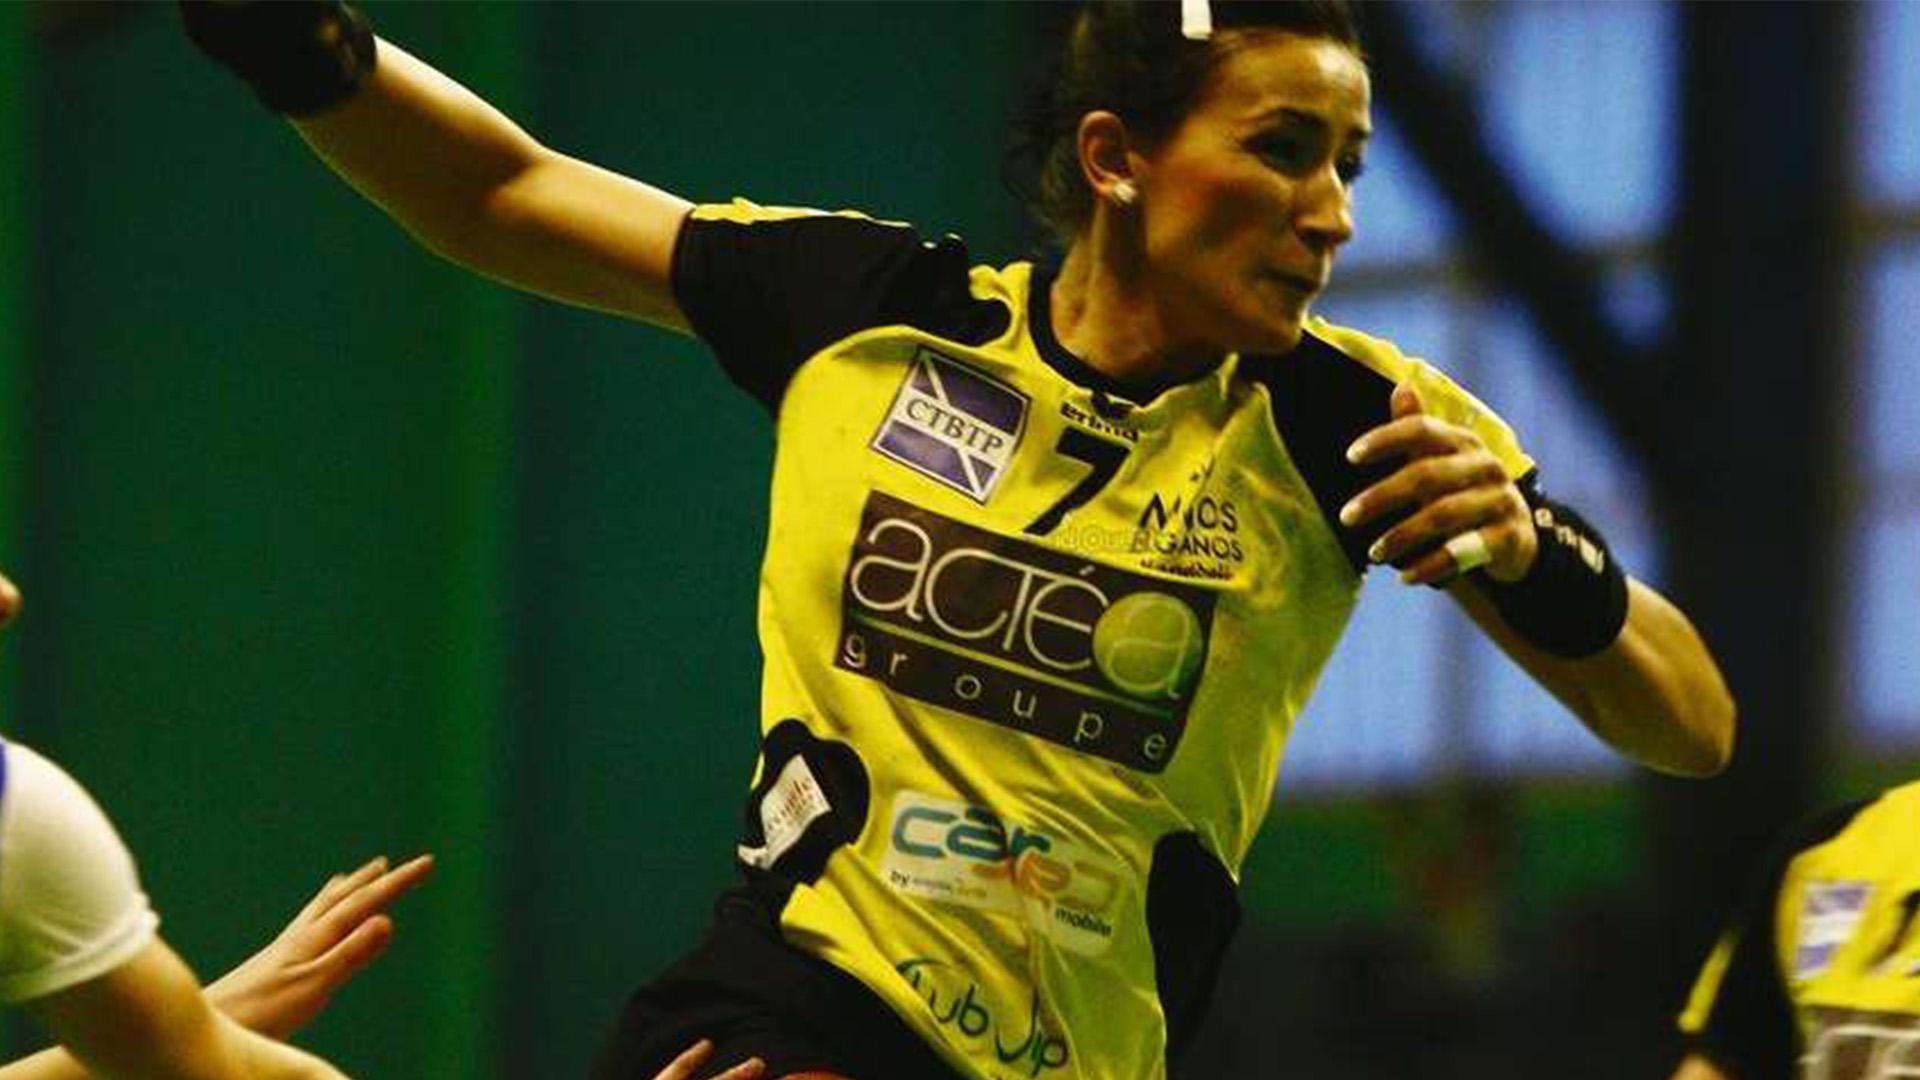 Maria jacob reconversion handball au bâtiment